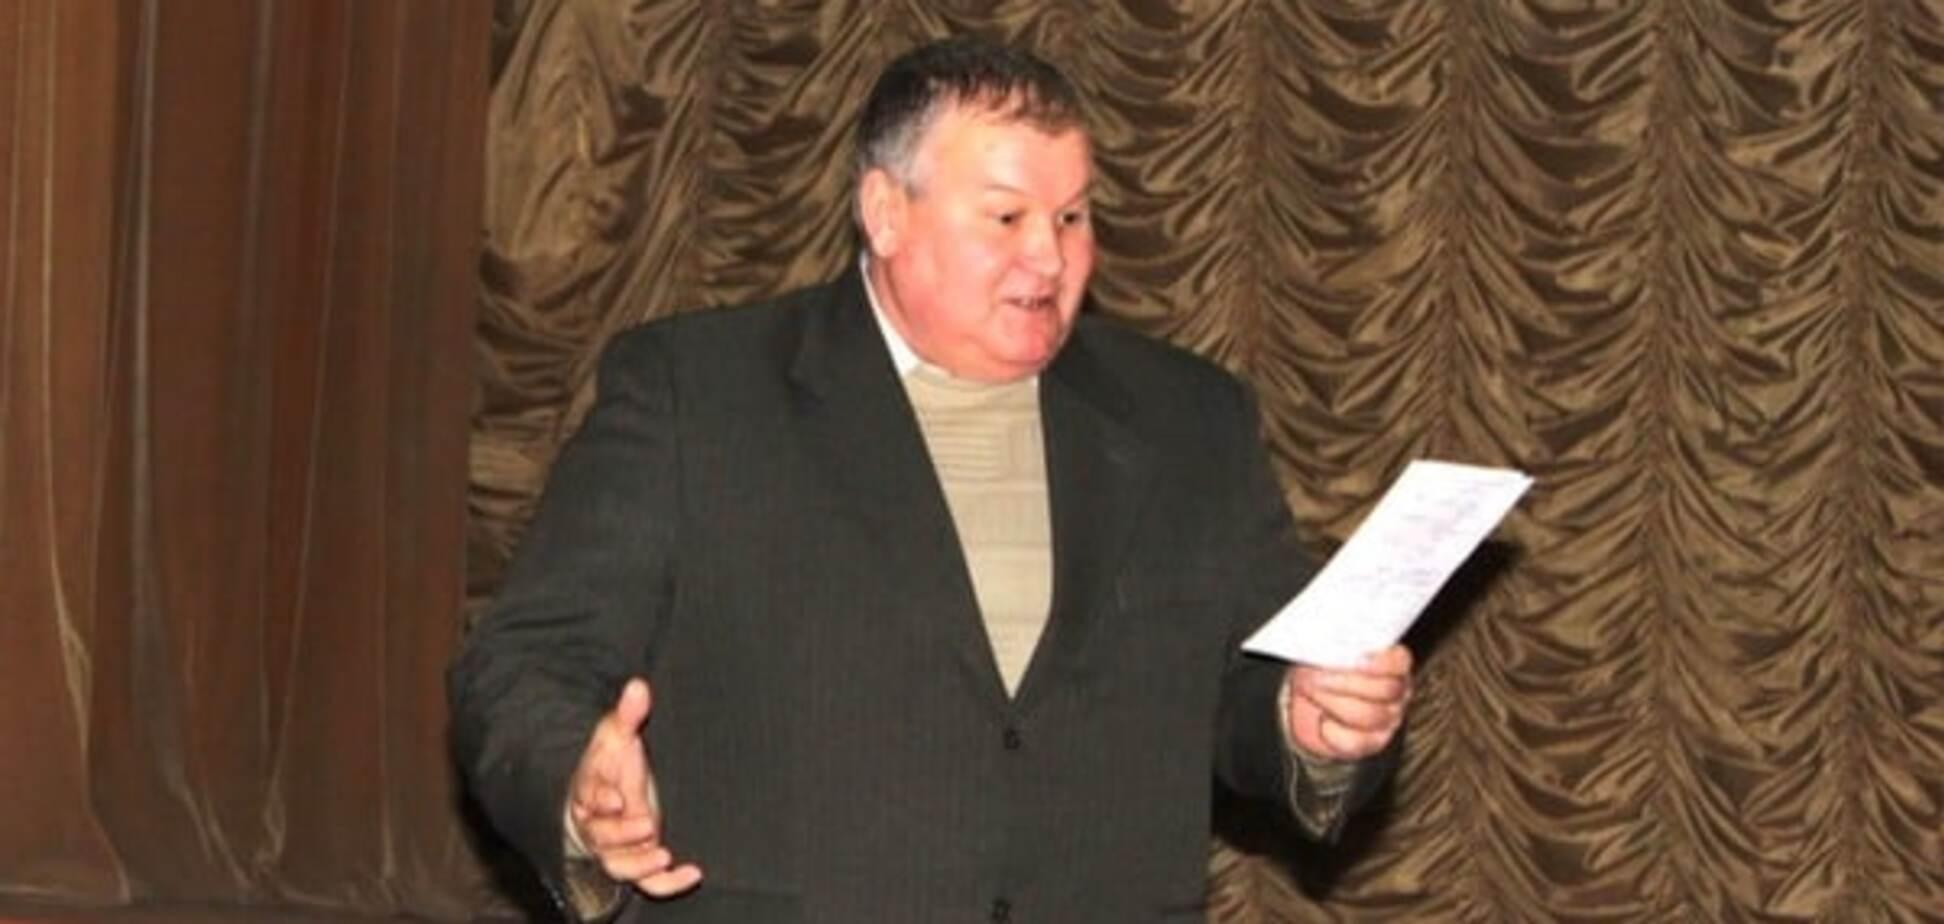 У Сімферополі 'депутат' написав 'антигейський маніфест'